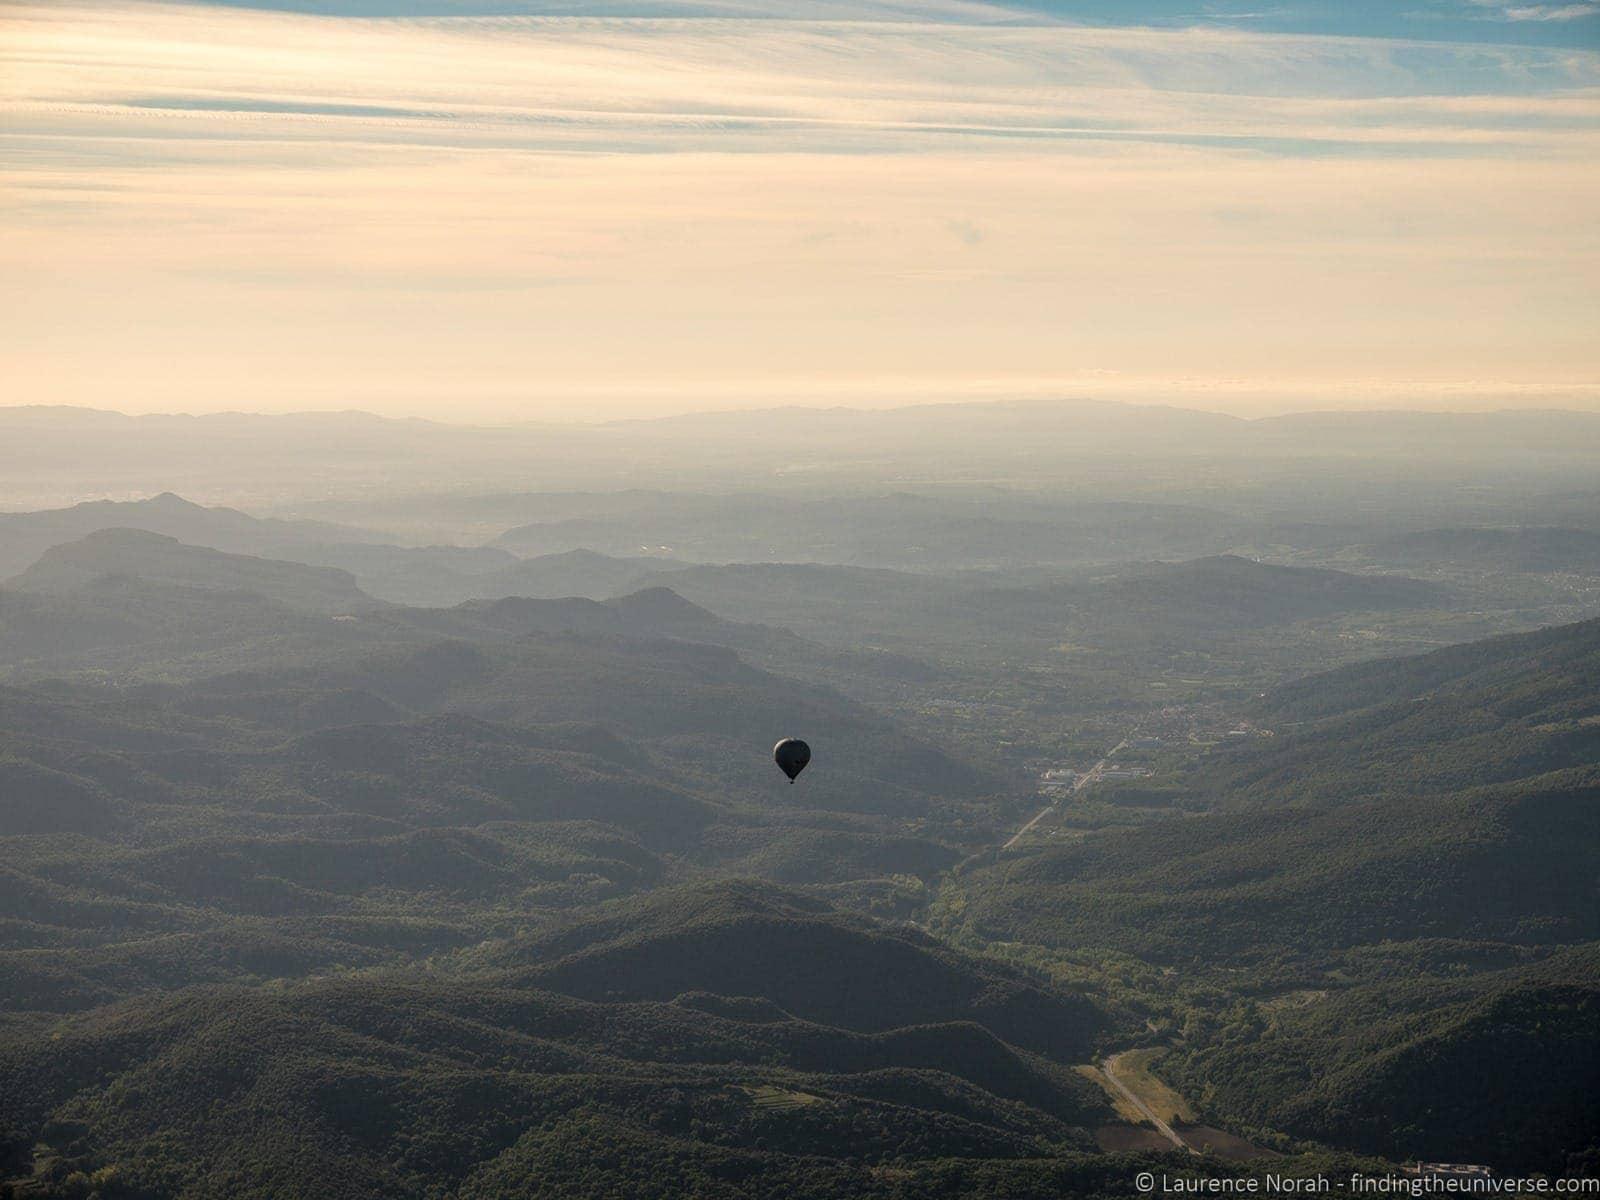 Balloon Vol de Coloms Costa Brava 30